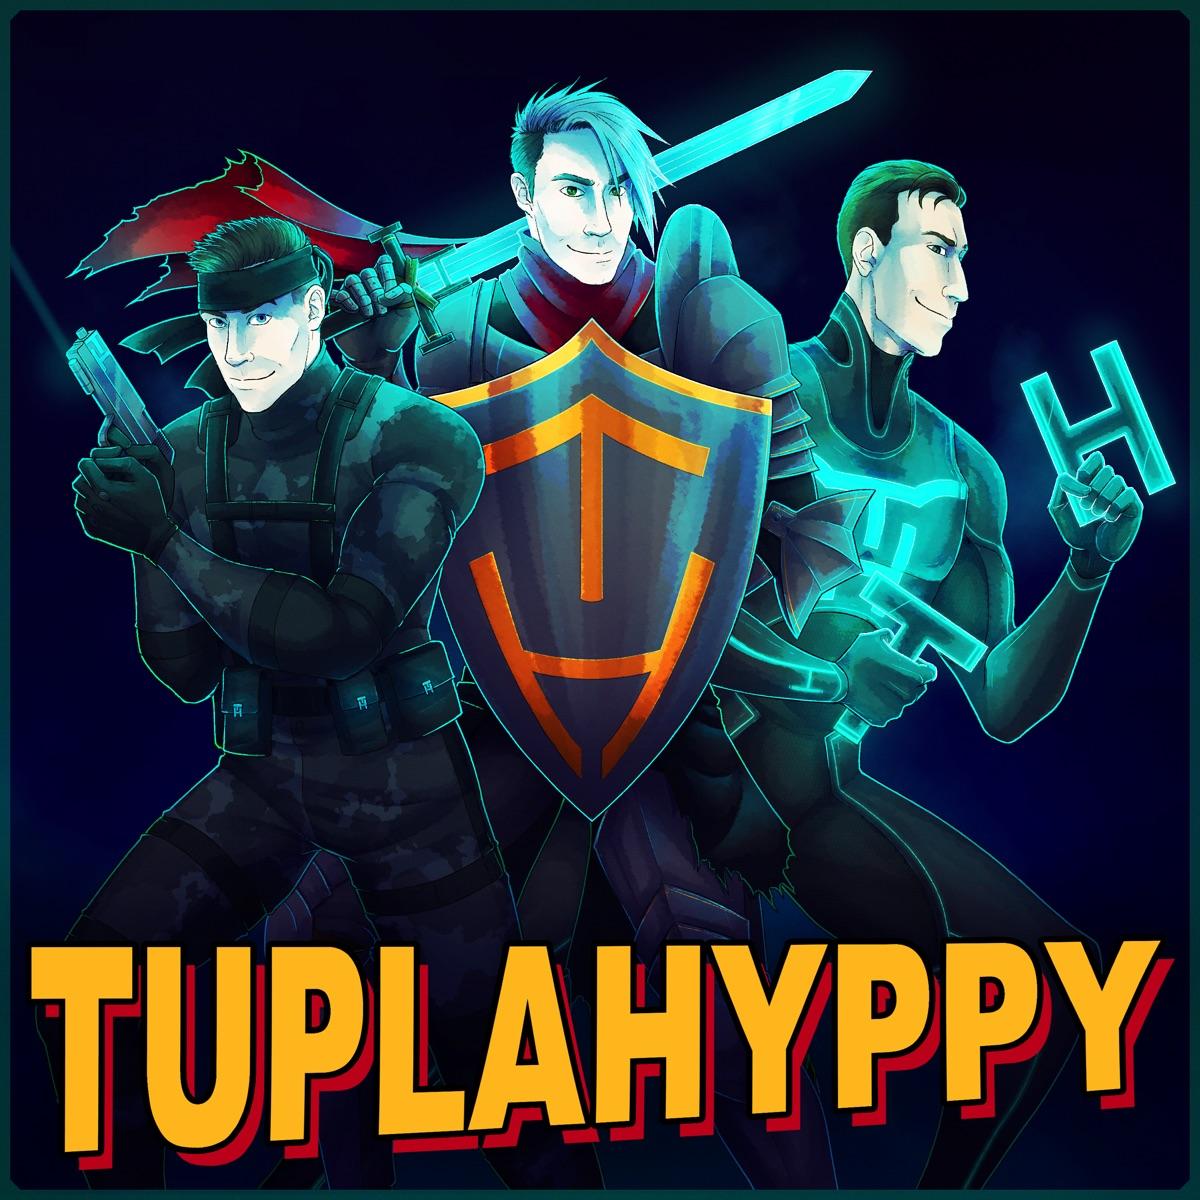 Tuplahyppy